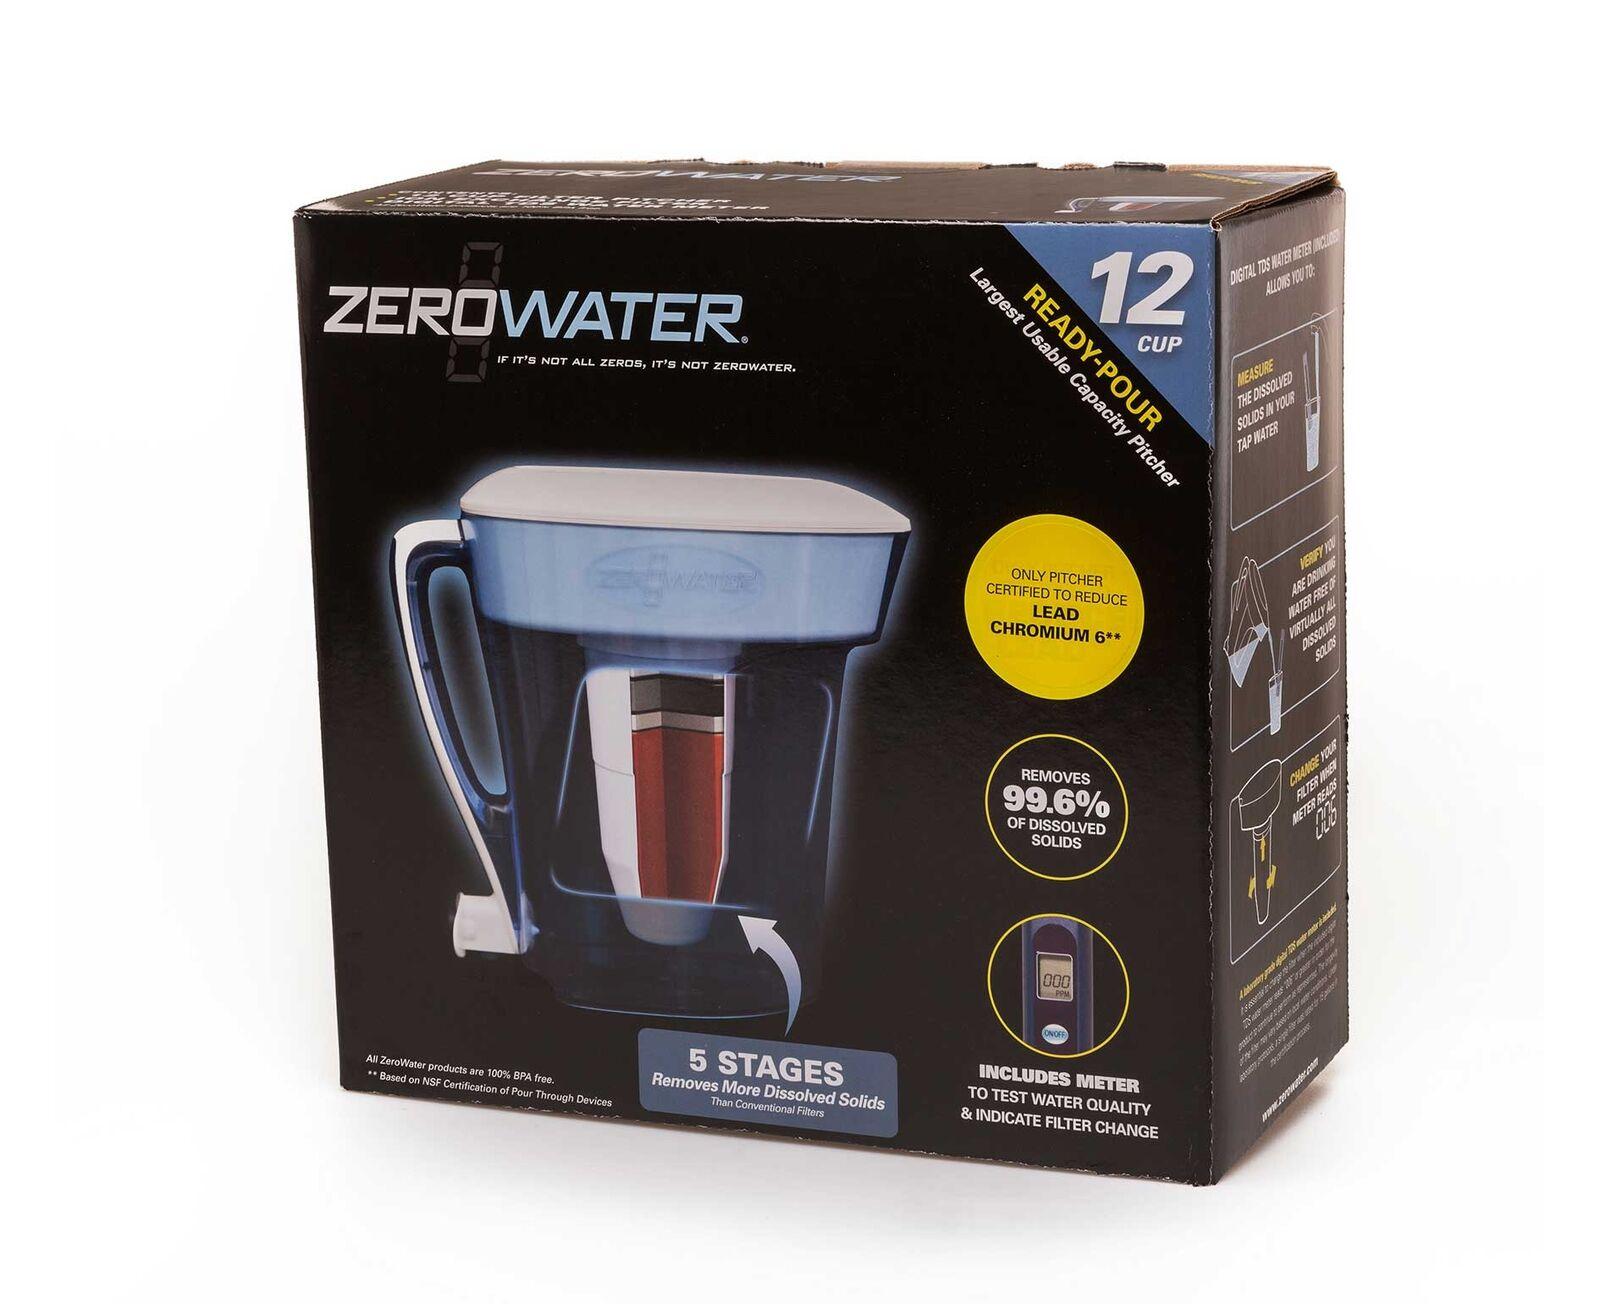 ZeroWater 12 Cup Water Filter Jug - Blue | eBay